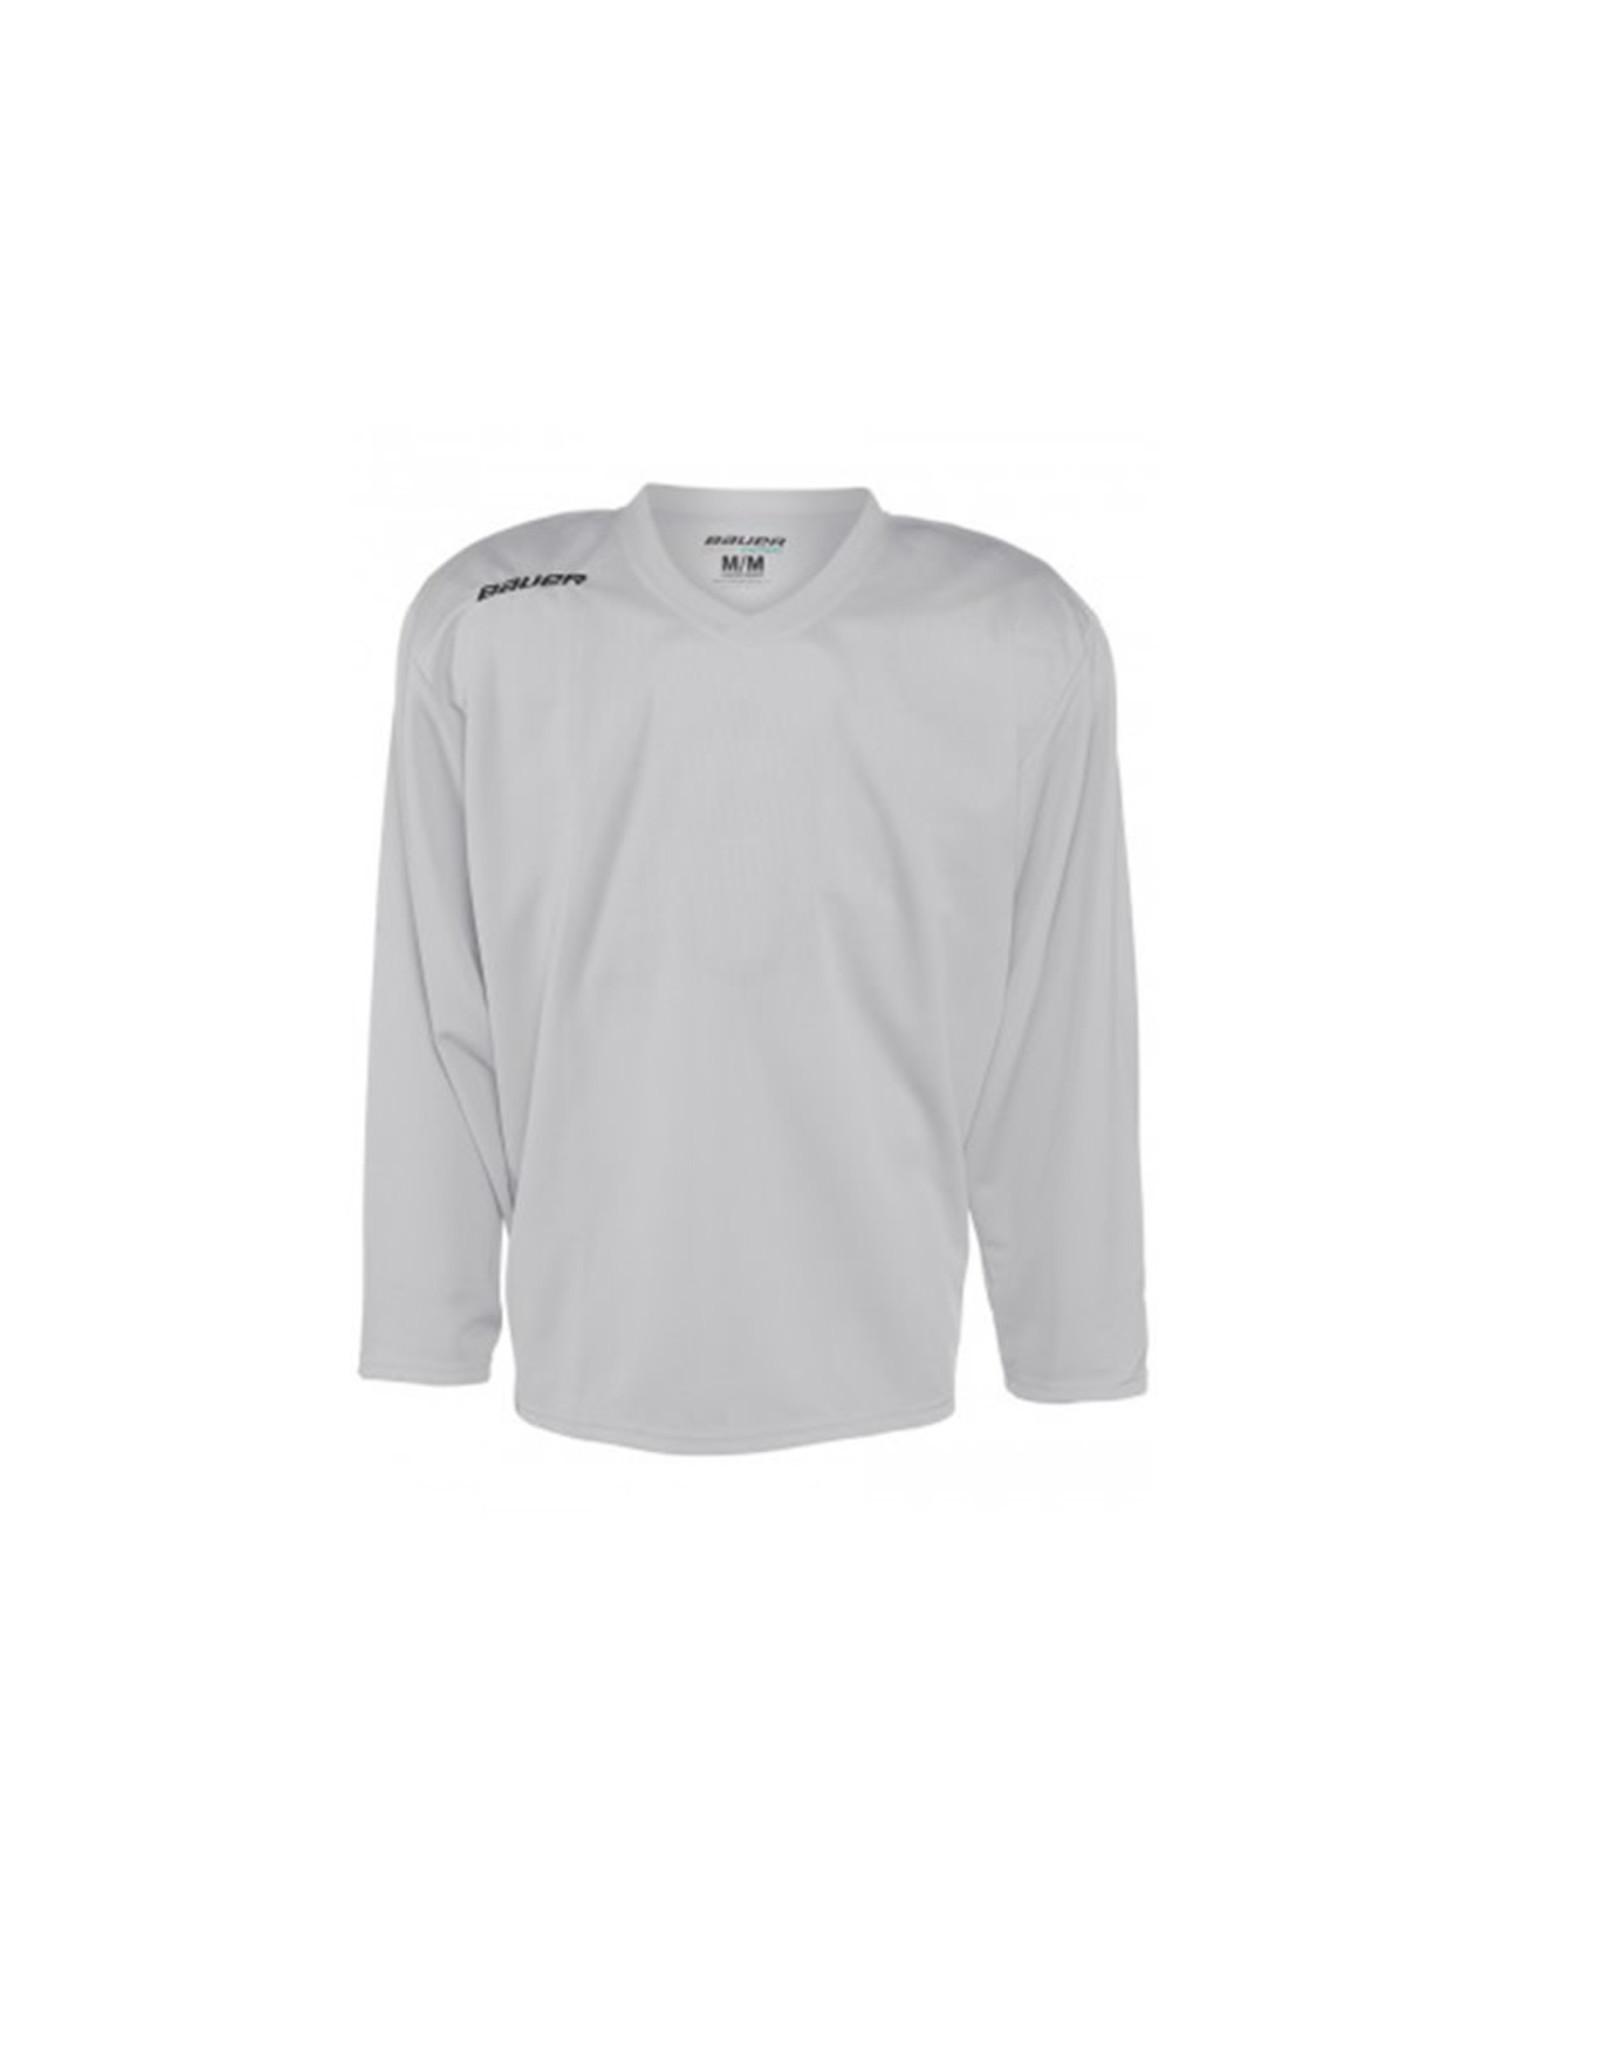 Goalie Flex Practice Shirt SR